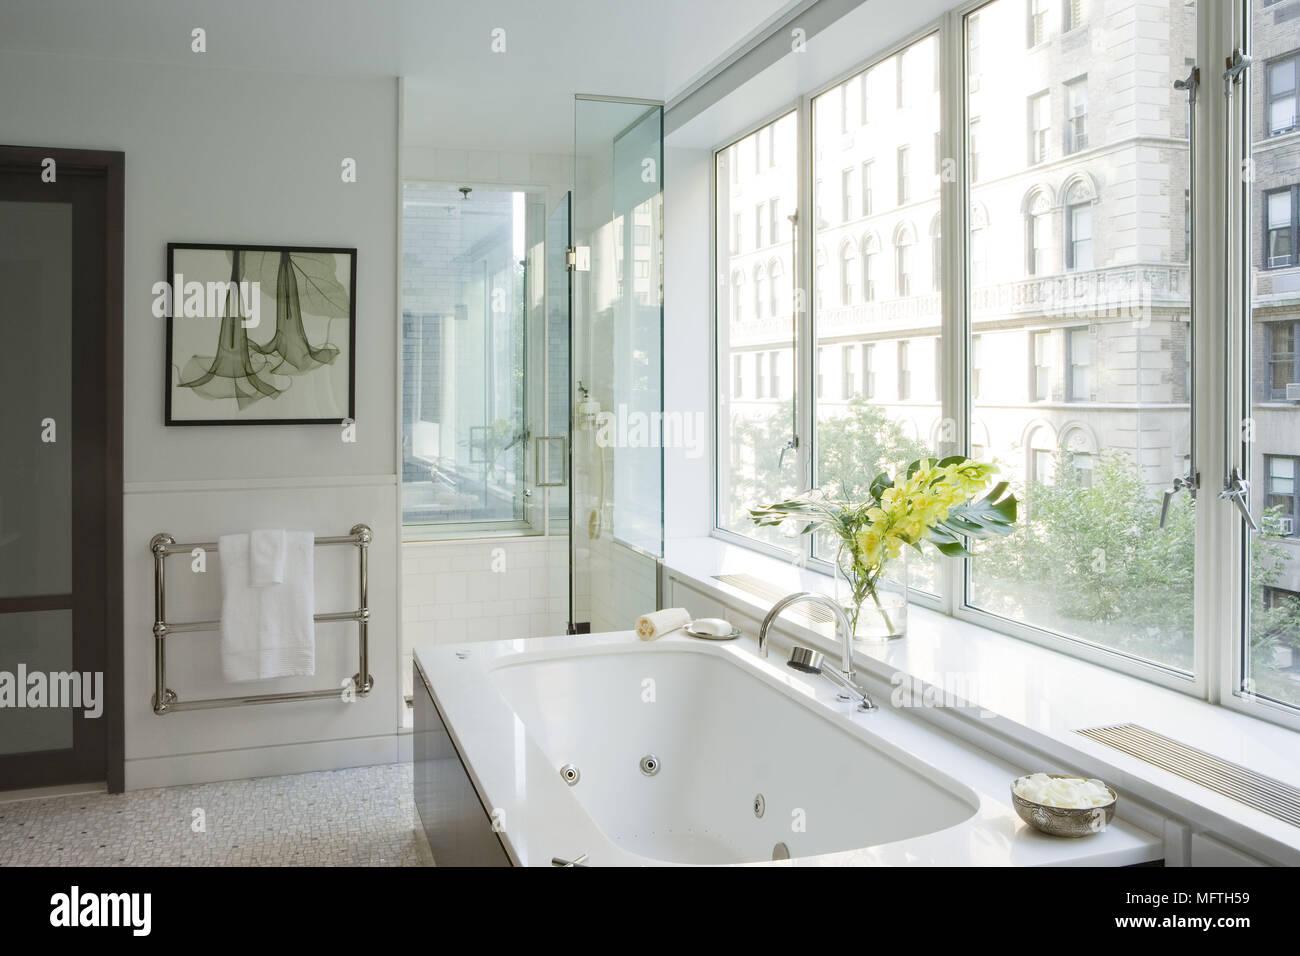 Bathtub under window in modern bathroom with shower cubicle Stock ...